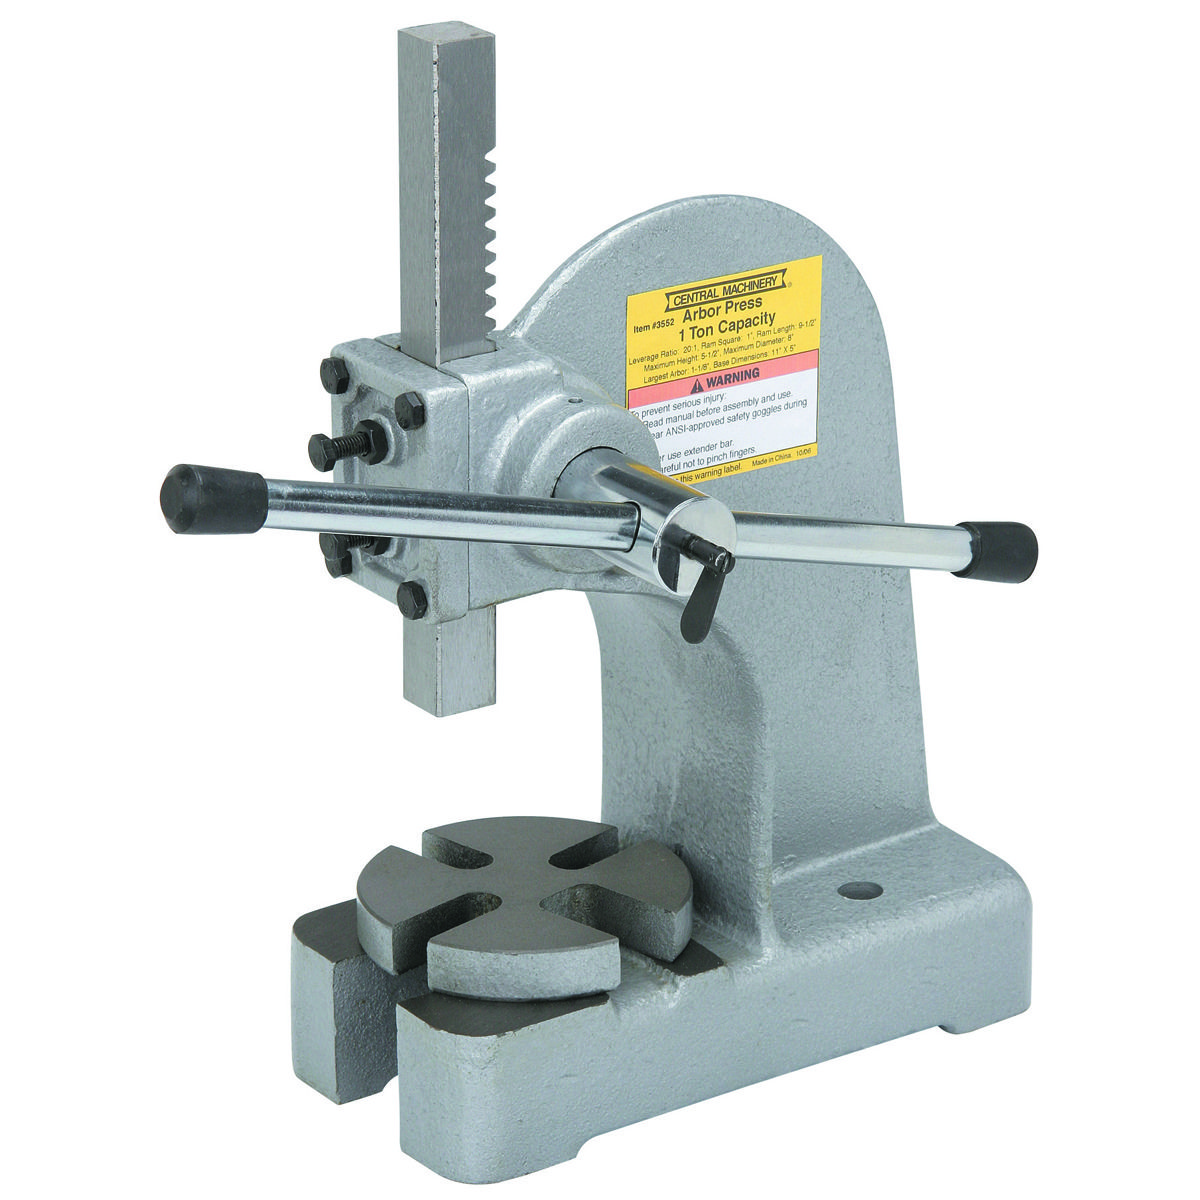 dremel tool harbor freight. 1 ton arbor press. leather toolingjewelry toolspower toolsarborsharbor freight dremel tool harbor o